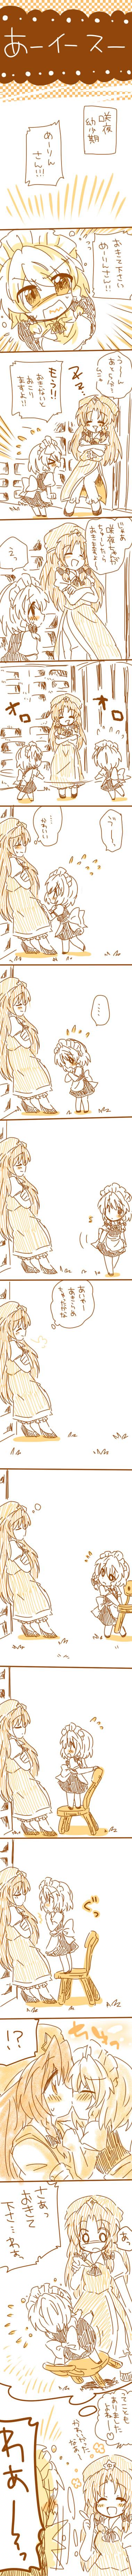 hong meiling and izayoi sakuya (touhou) drawn by eromame